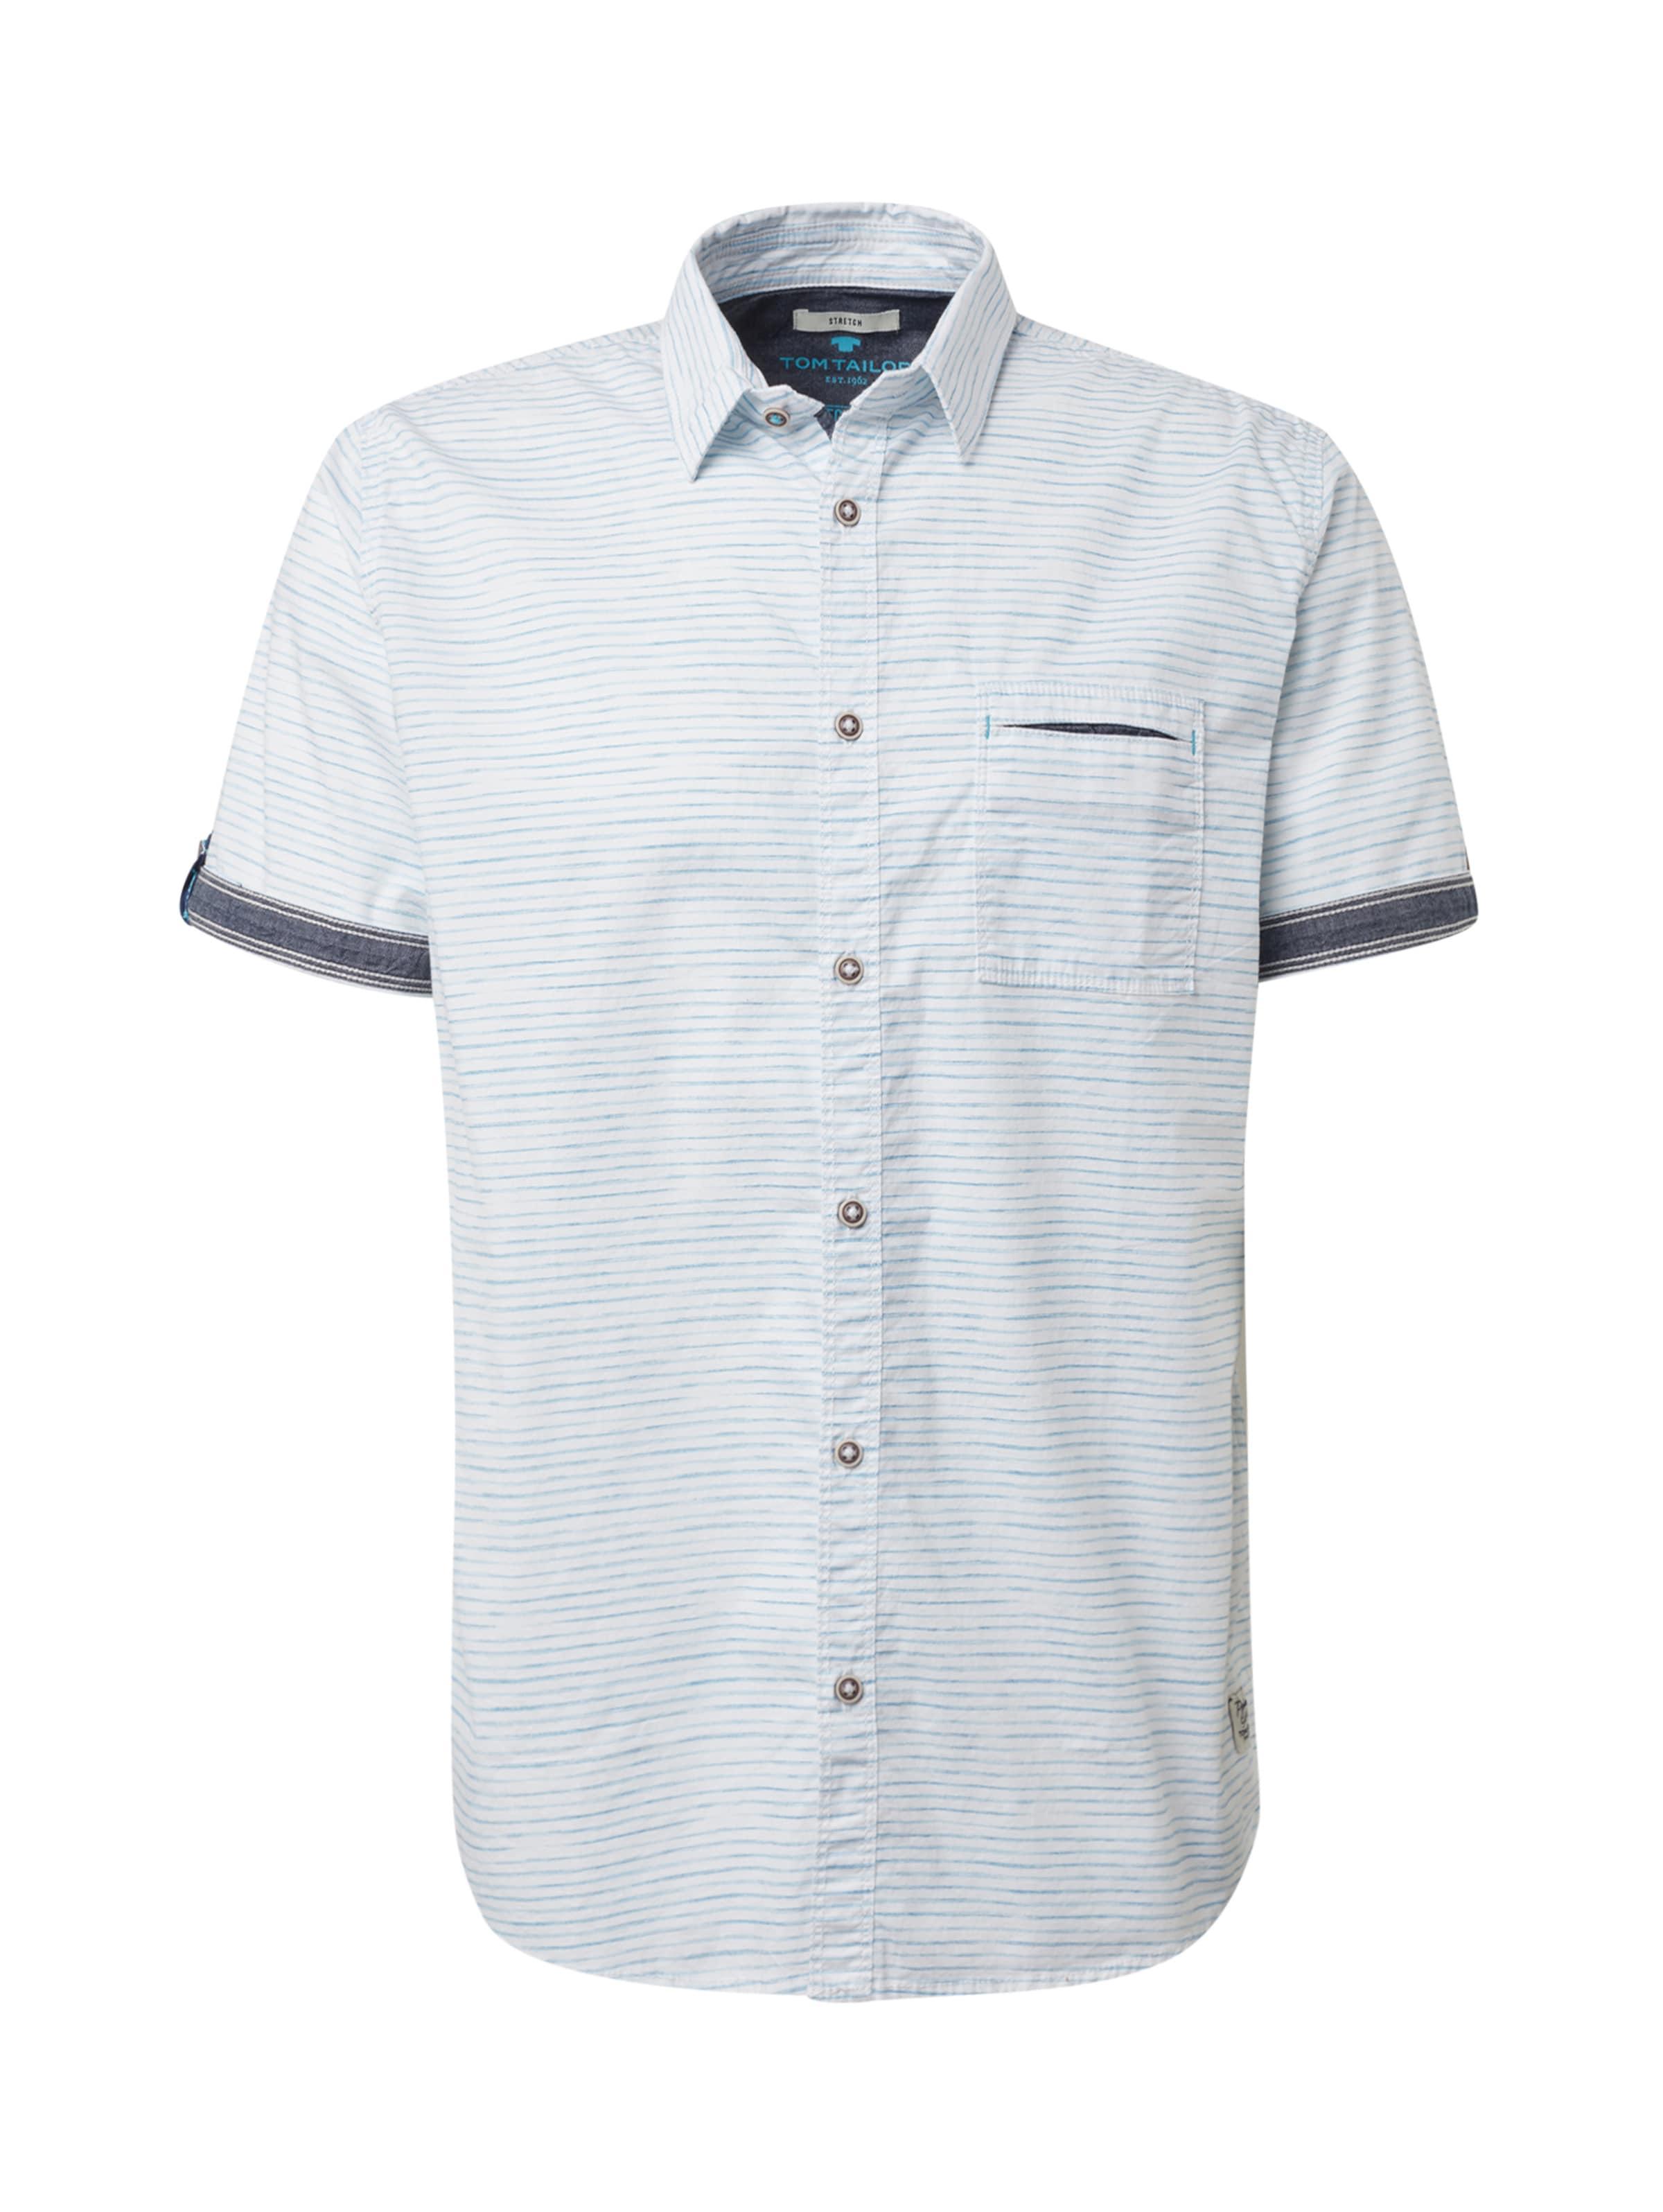 Hemd In Weiß TaubenblauHellblau Tailor Tom QxBWCdero